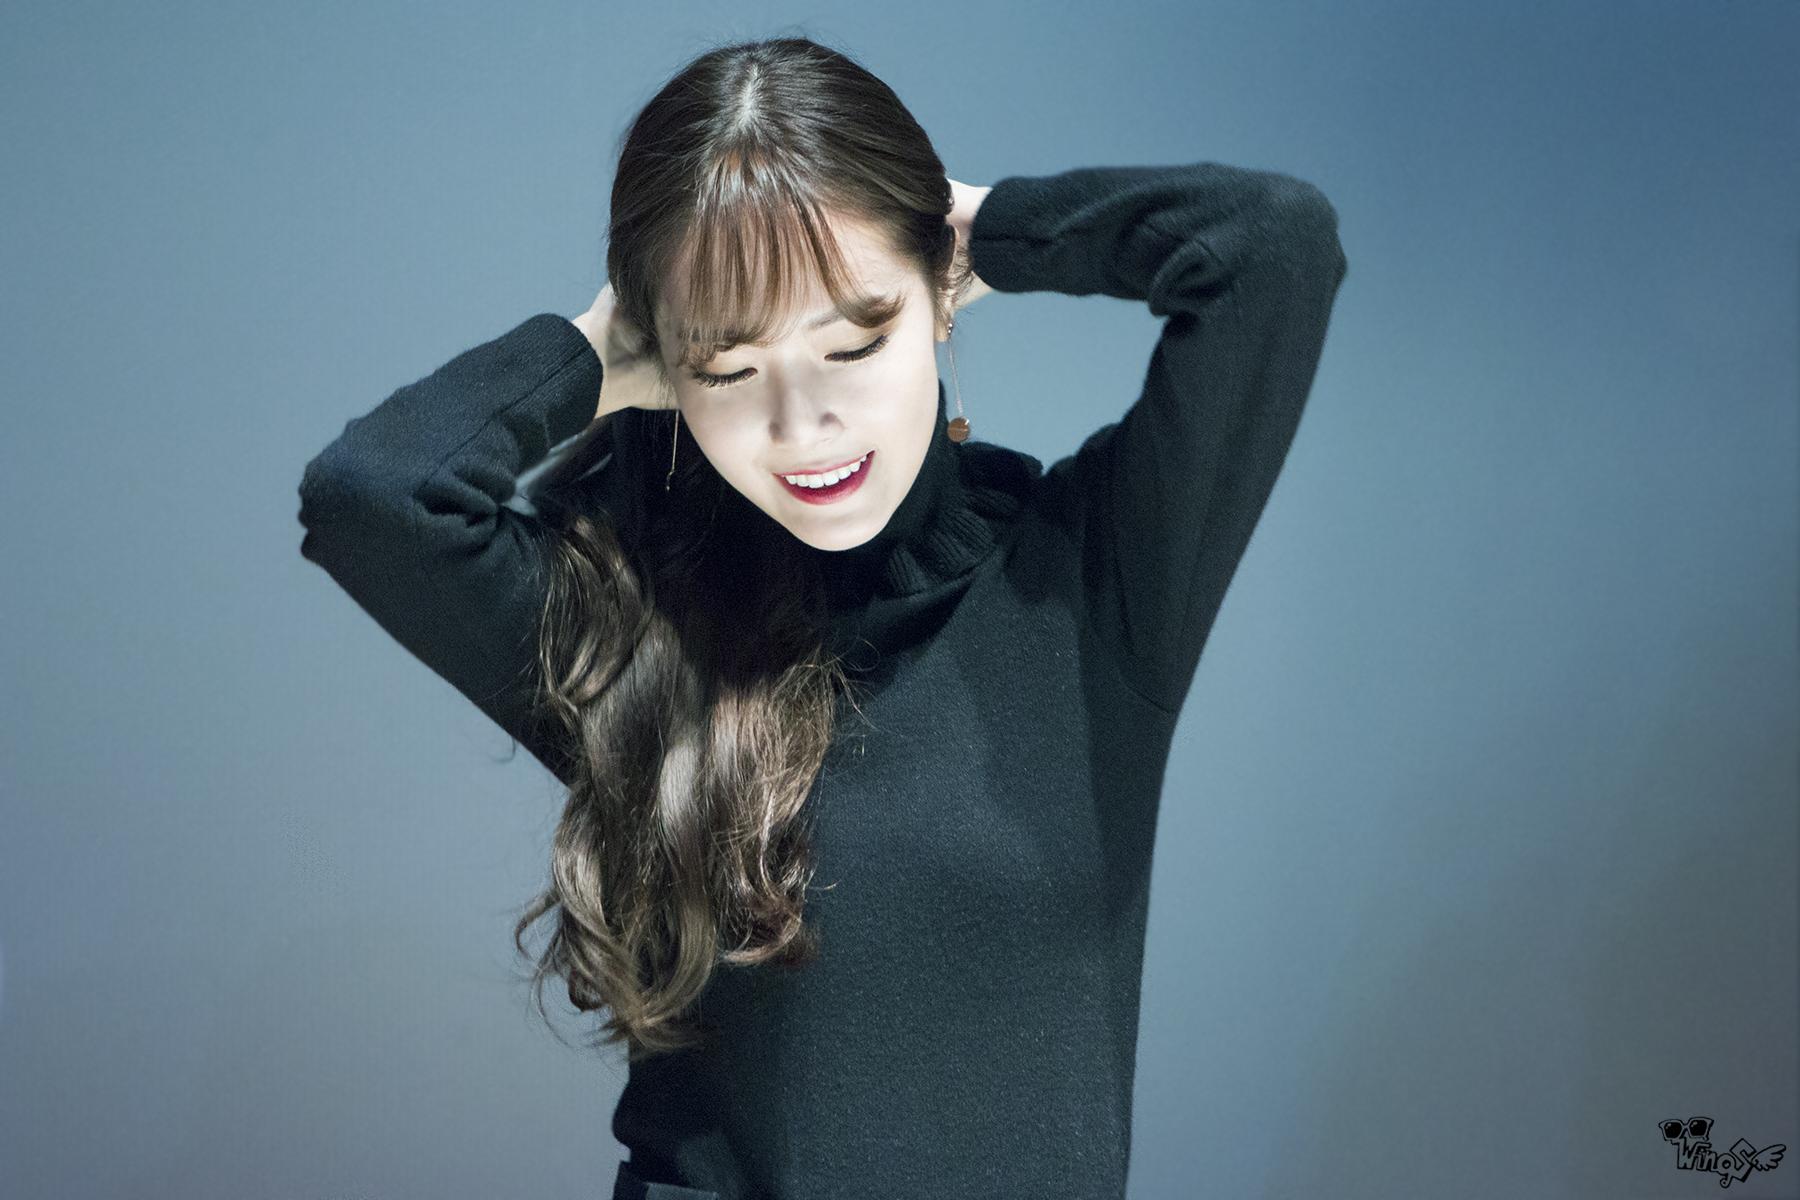 【B&E】ジェシカ応援スレ☆115【Jessica】 [無断転載禁止]©2ch.netYouTube動画>54本 ->画像>1640枚